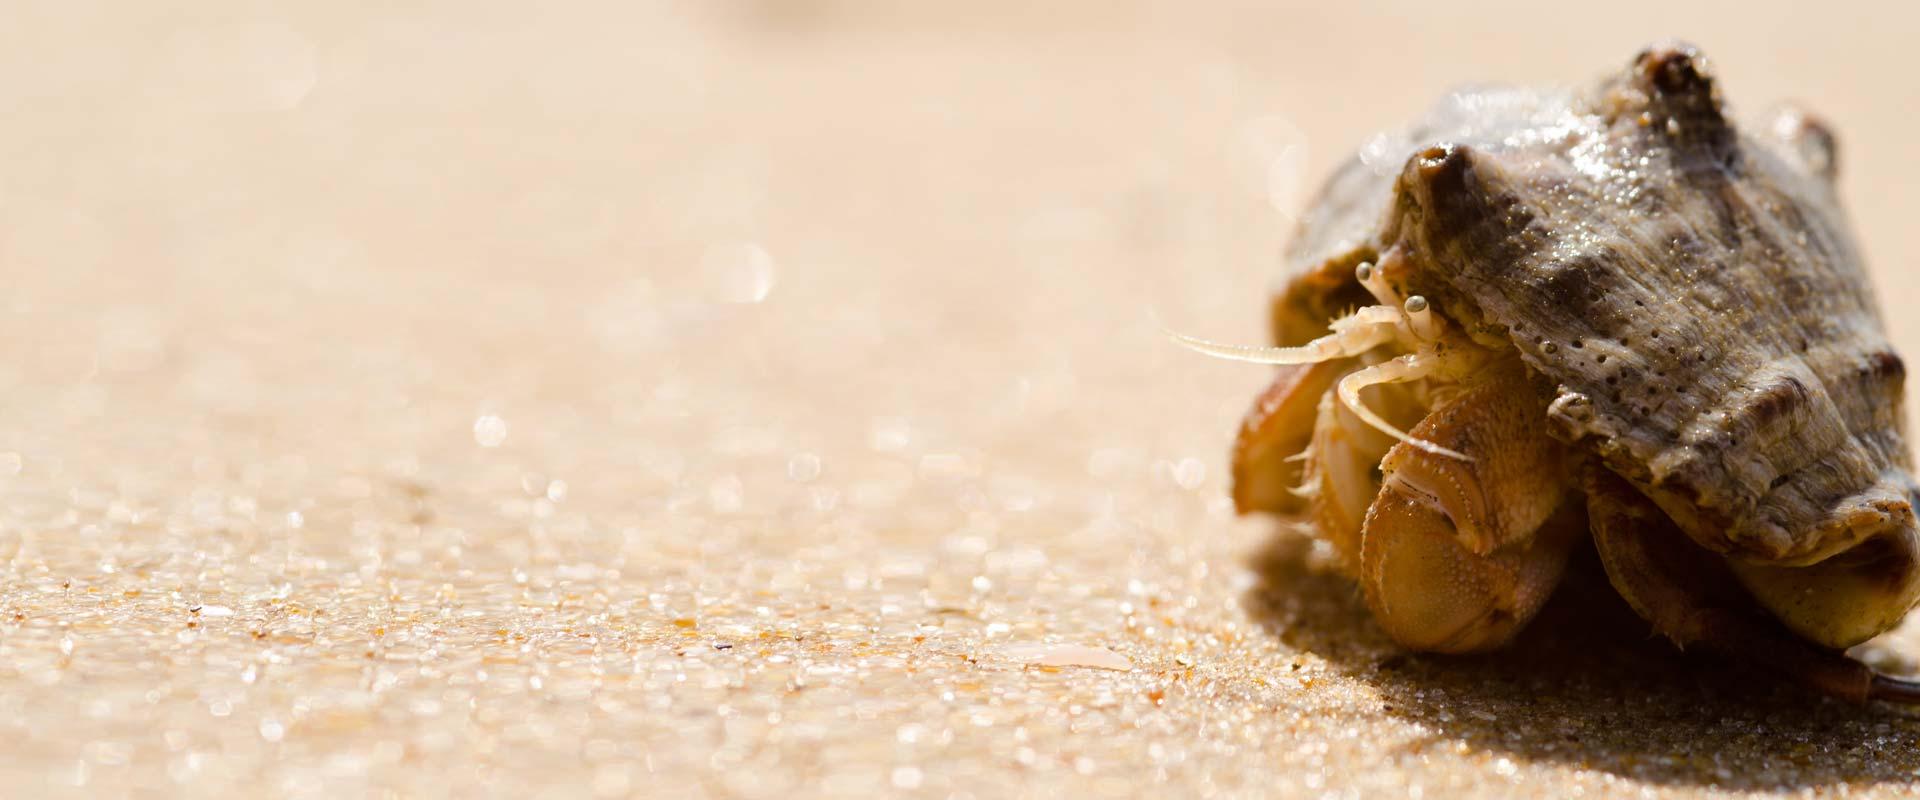 Candolim Beach – Hermit Crab